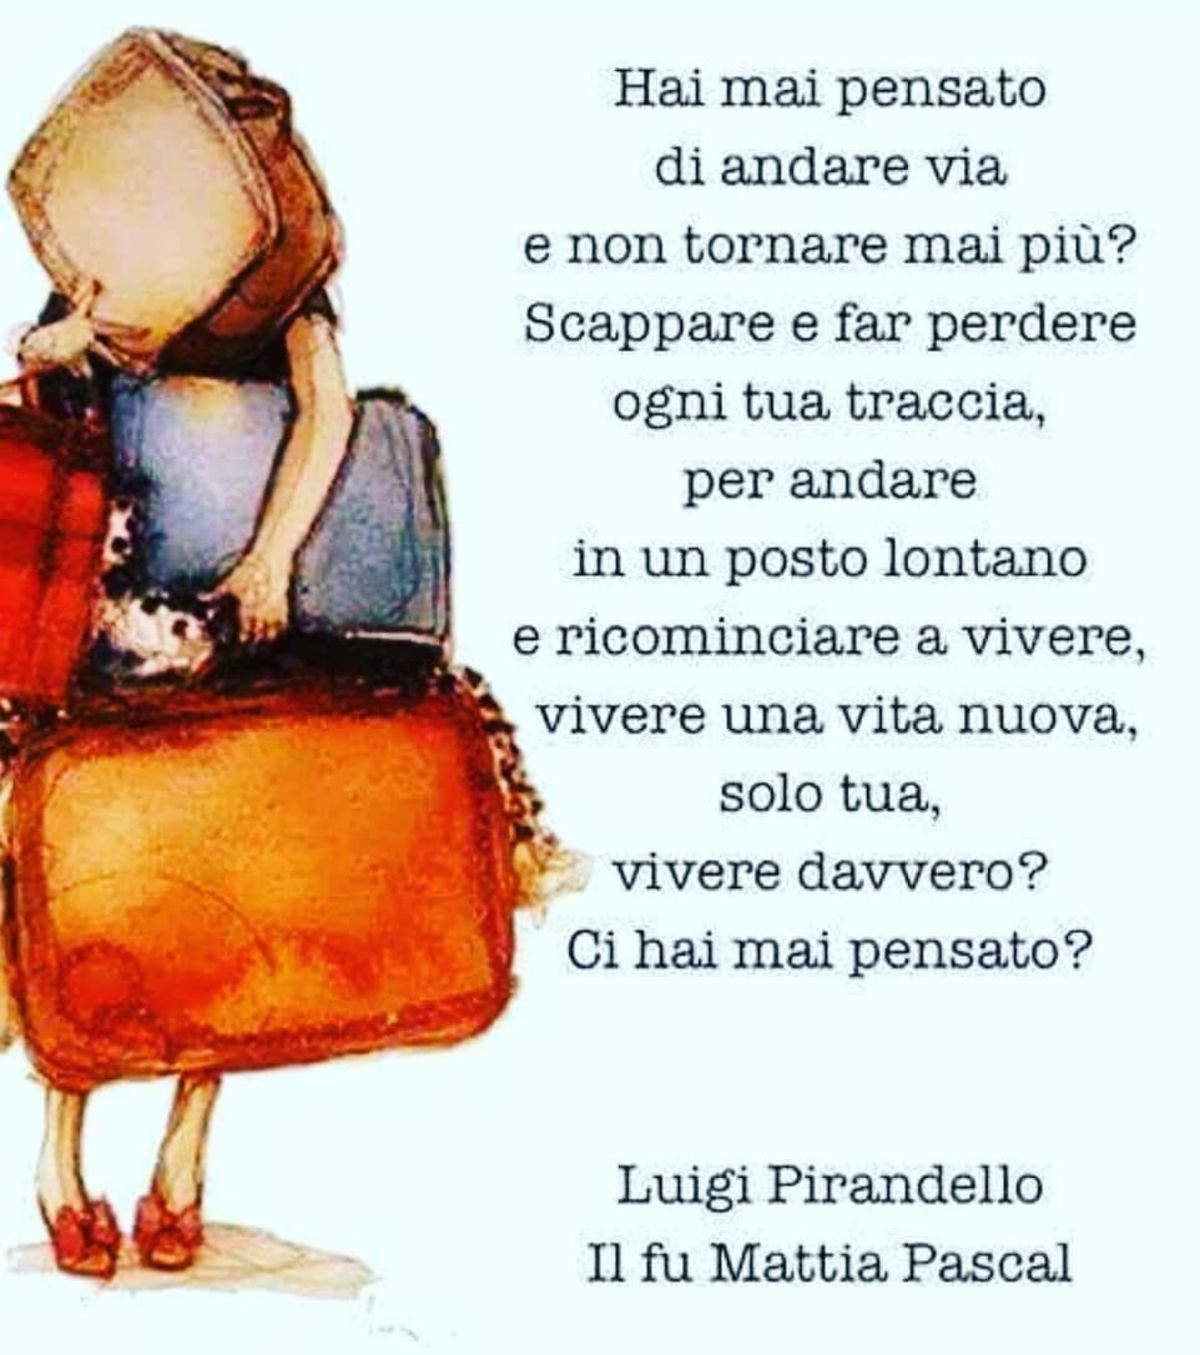 Frasi belle (Luigi Pirandello)